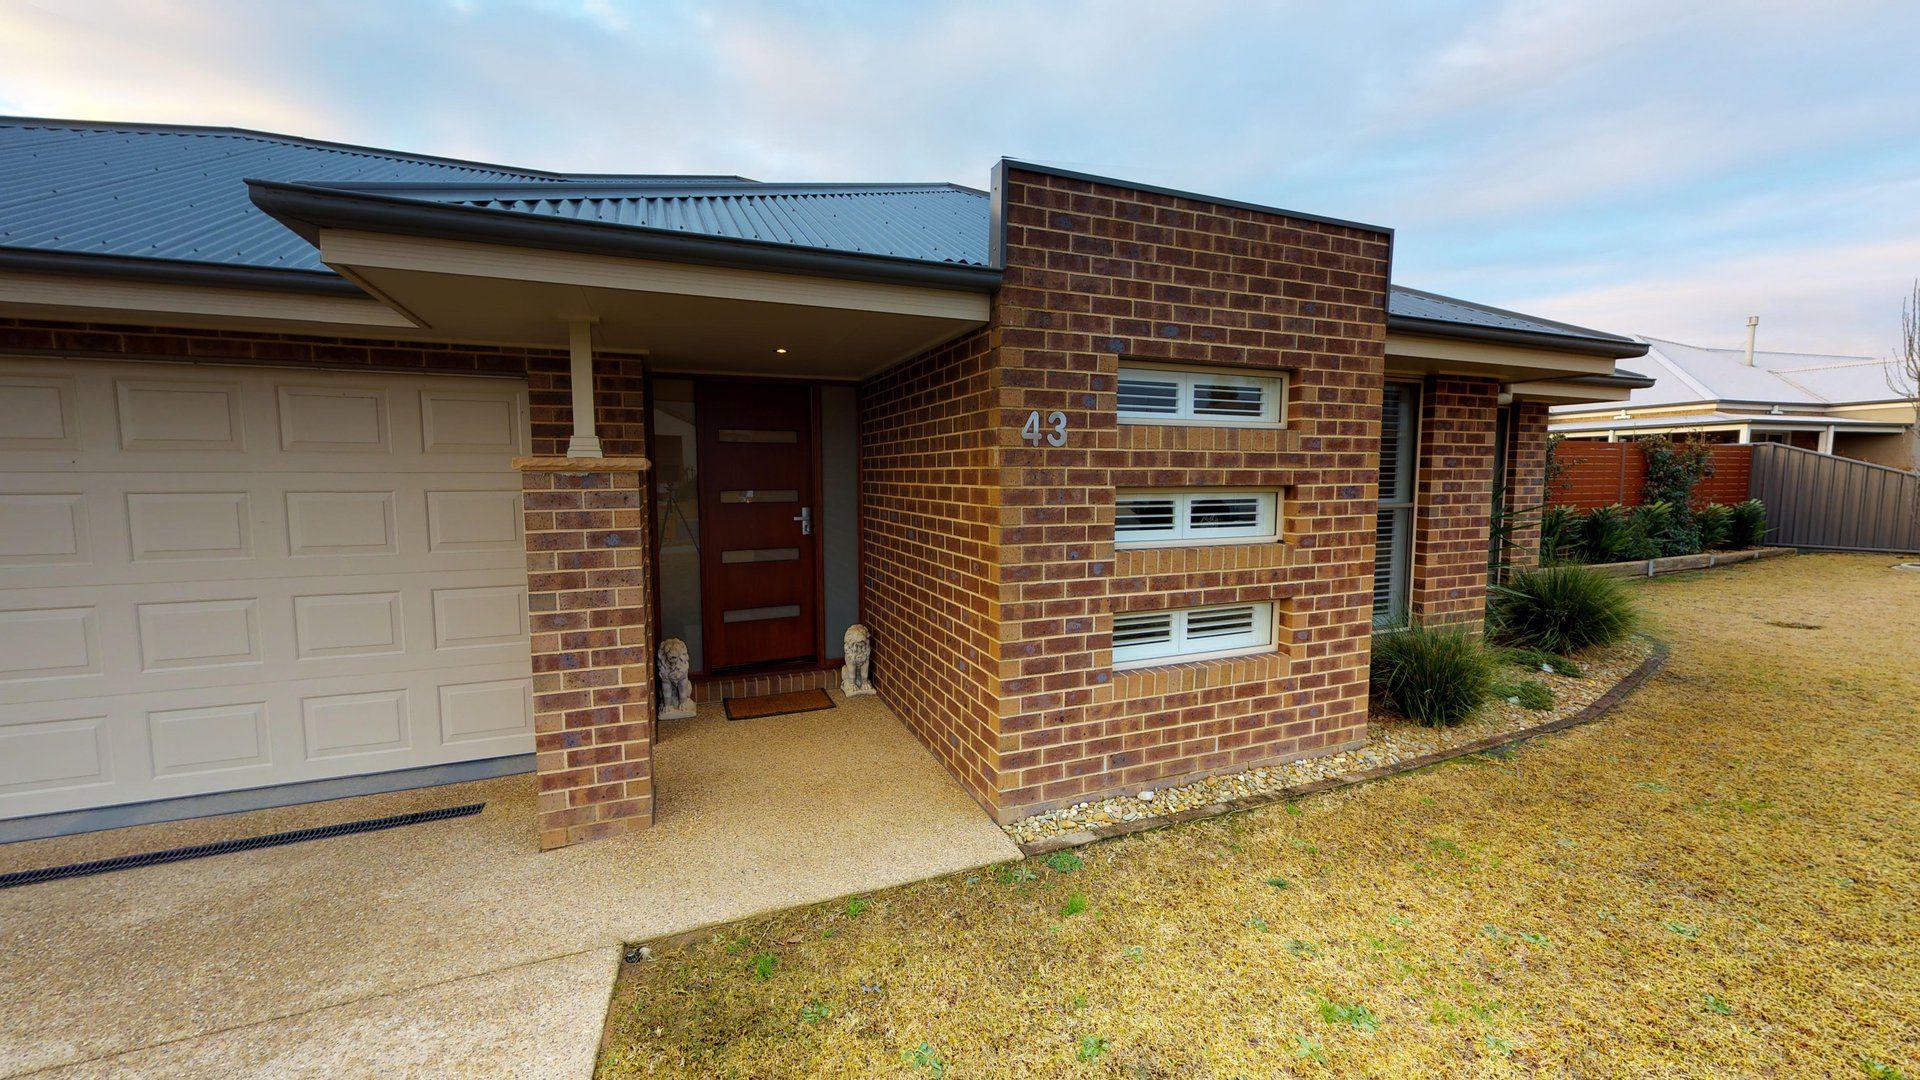 43 Corriedale Court, Thurgoona NSW 2640, Image 1